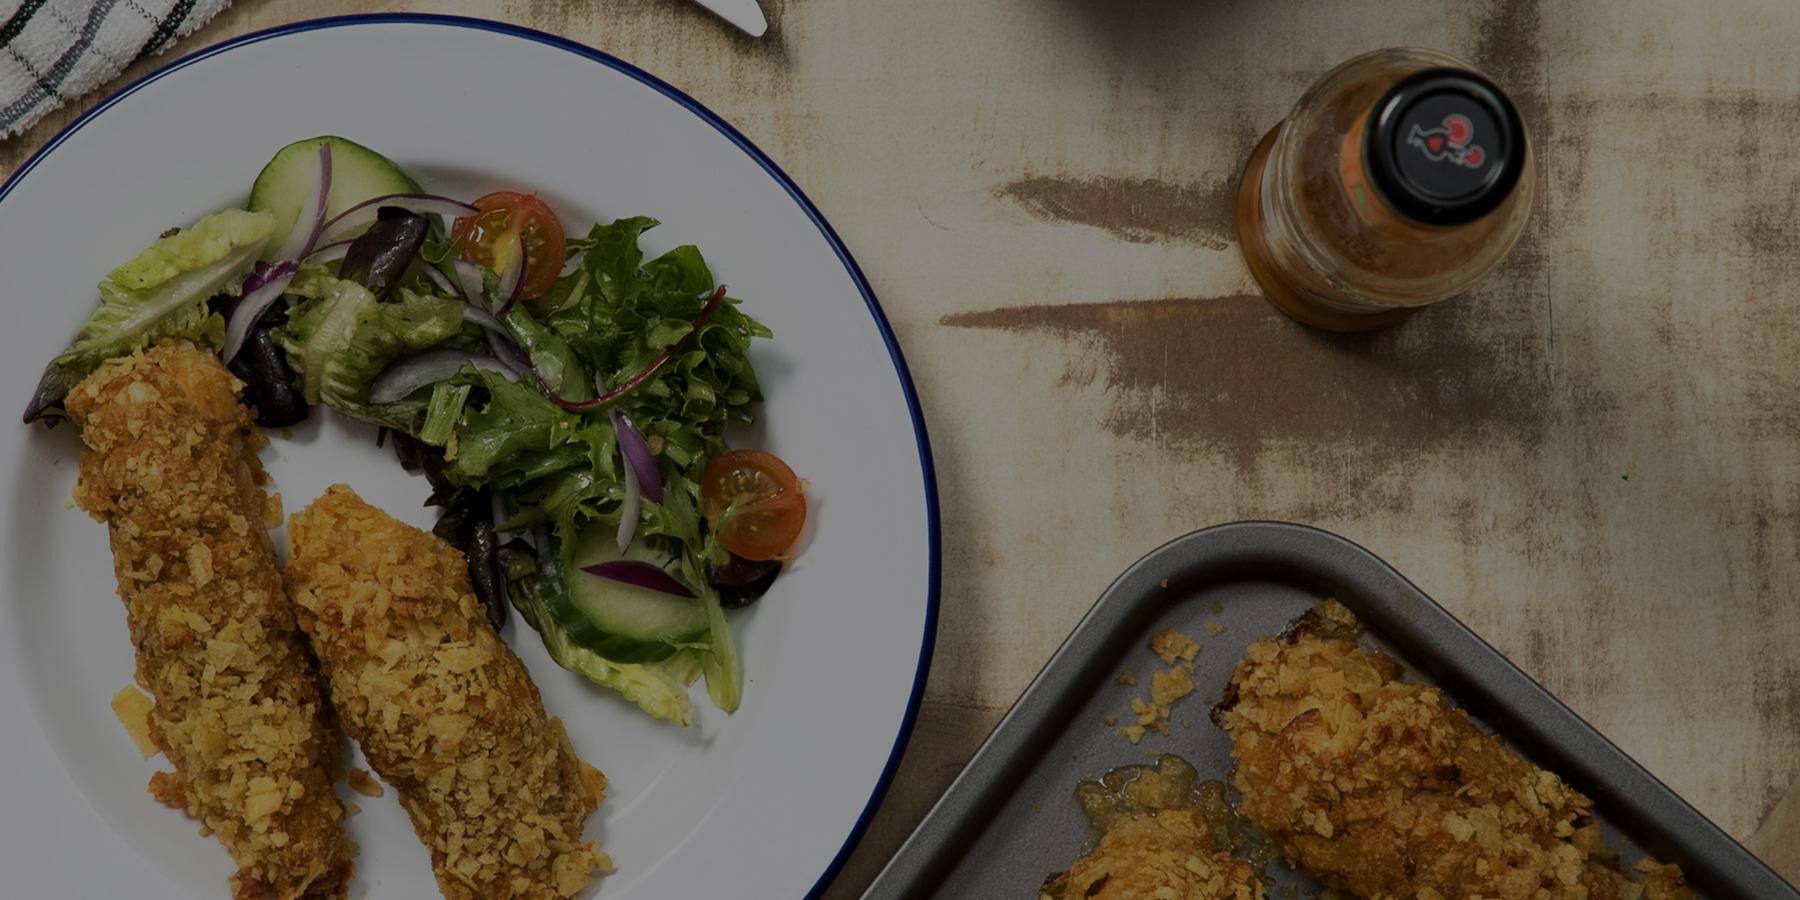 Crispy PERi-Parma Chicken